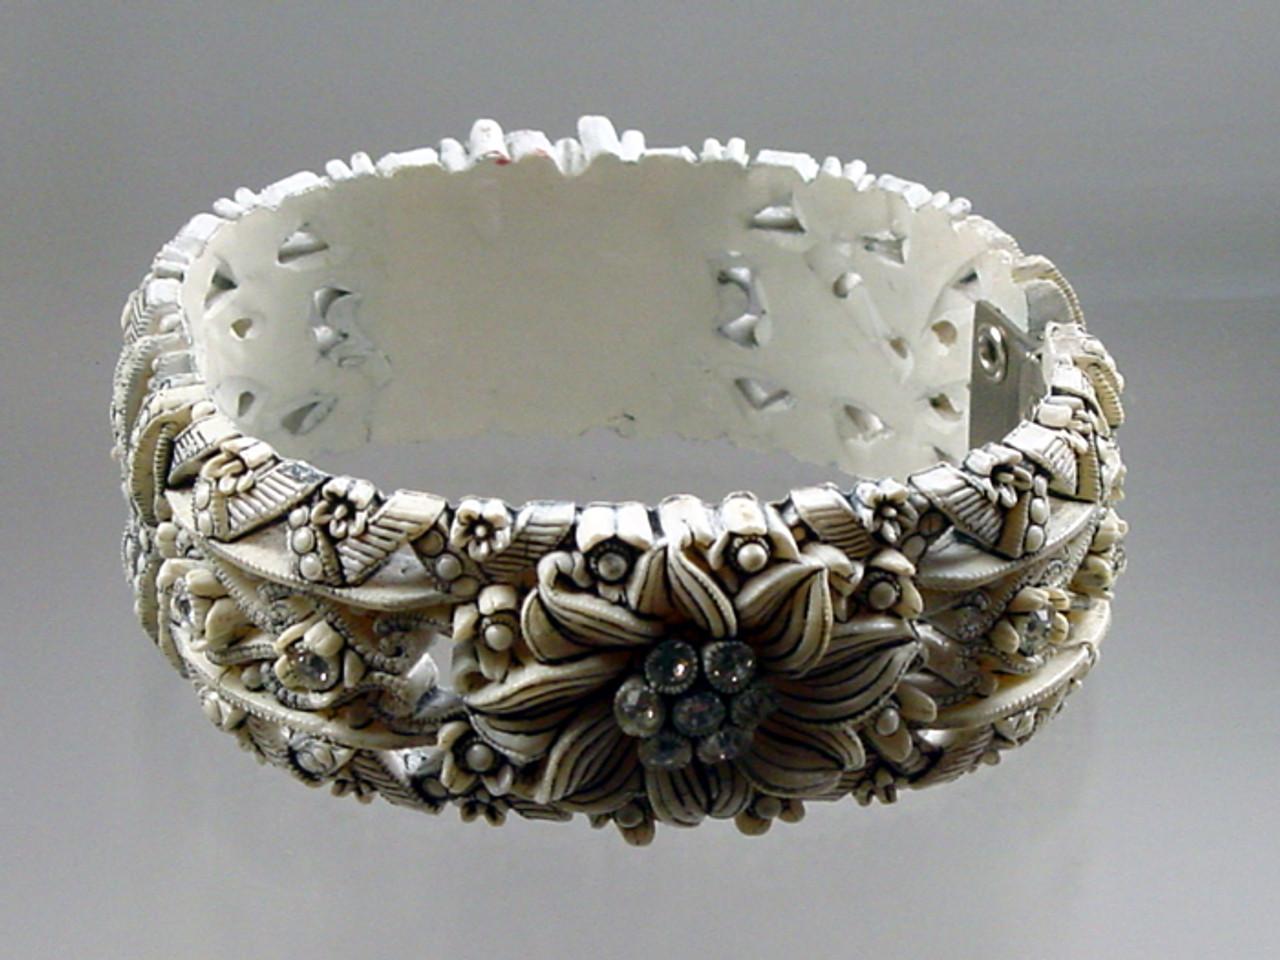 Celluloid Floral Rhinestone Clamper Bracelet